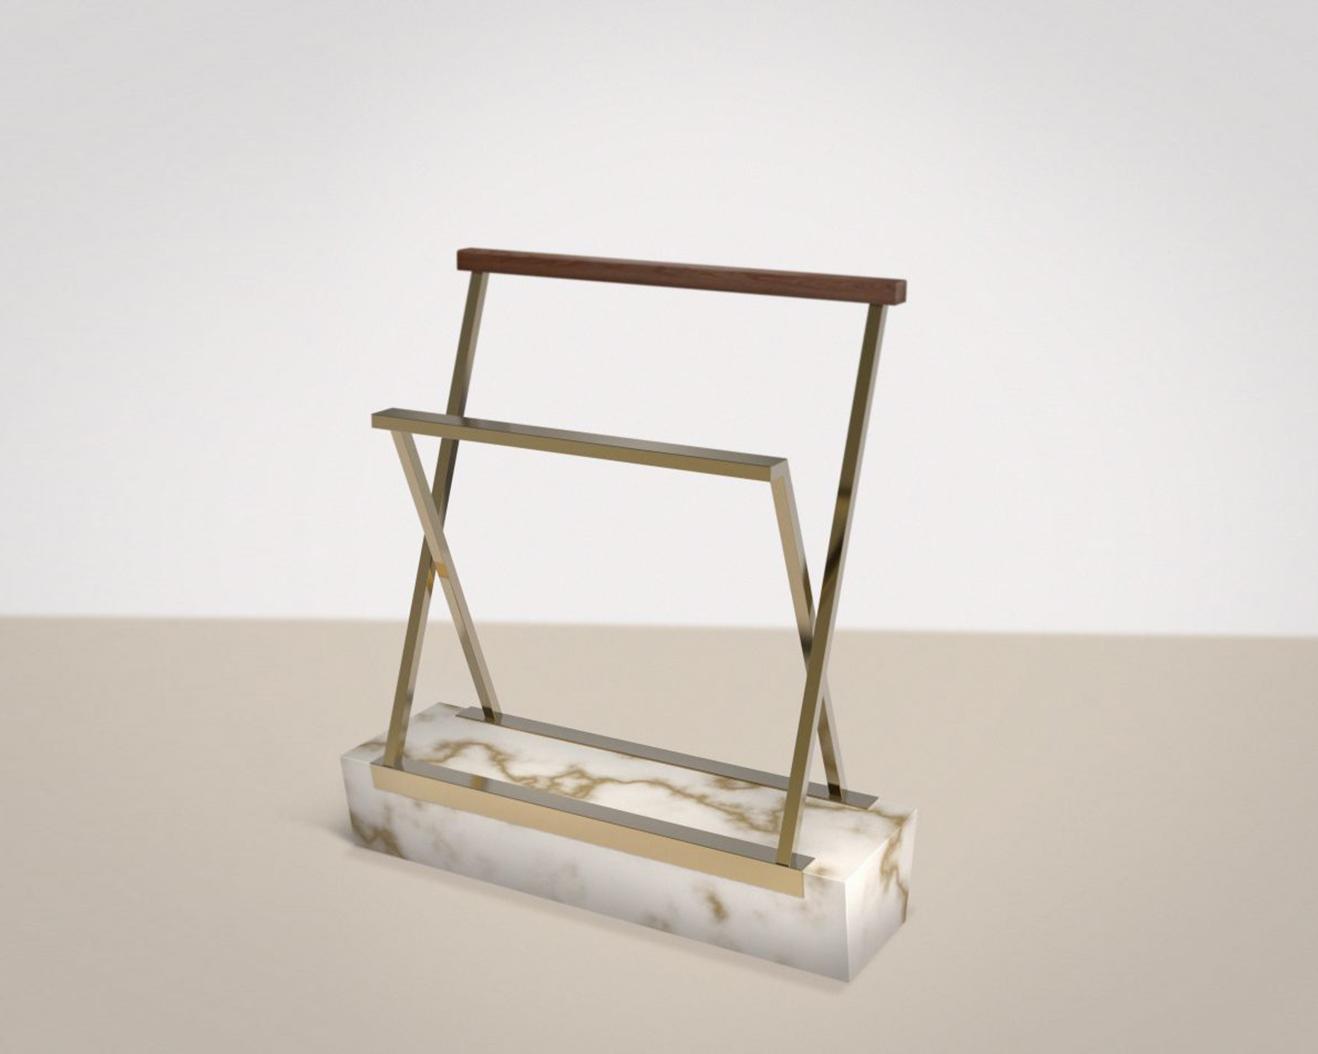 Porte-serviettes-PONTOS-Hormé-SavannahBay-design